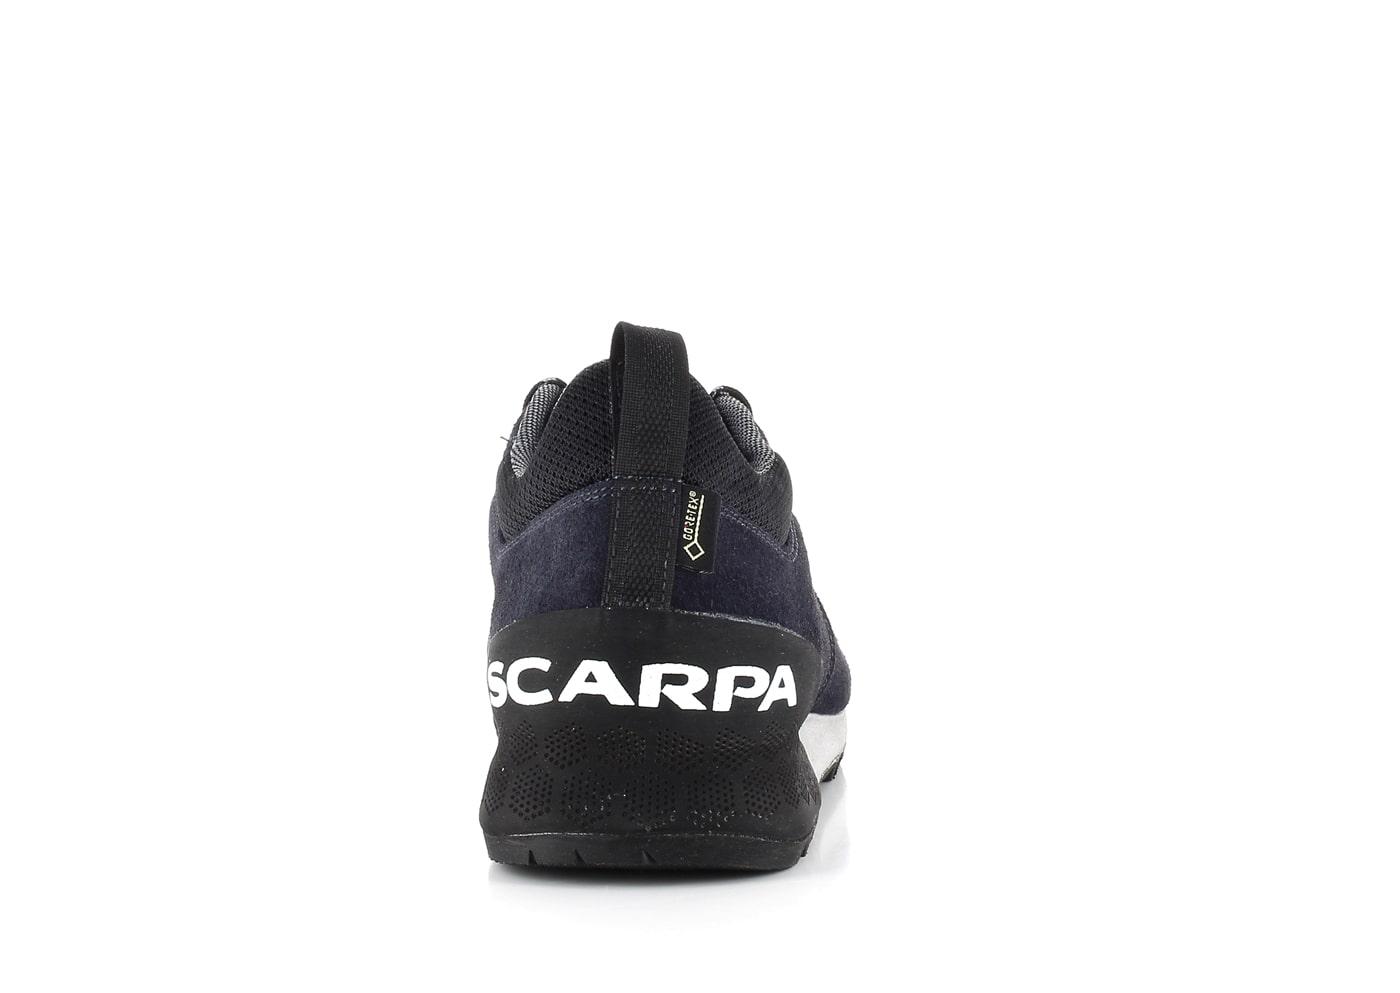 Scarpa Kalipe GTX deep gray Zustiegsschuhe 6